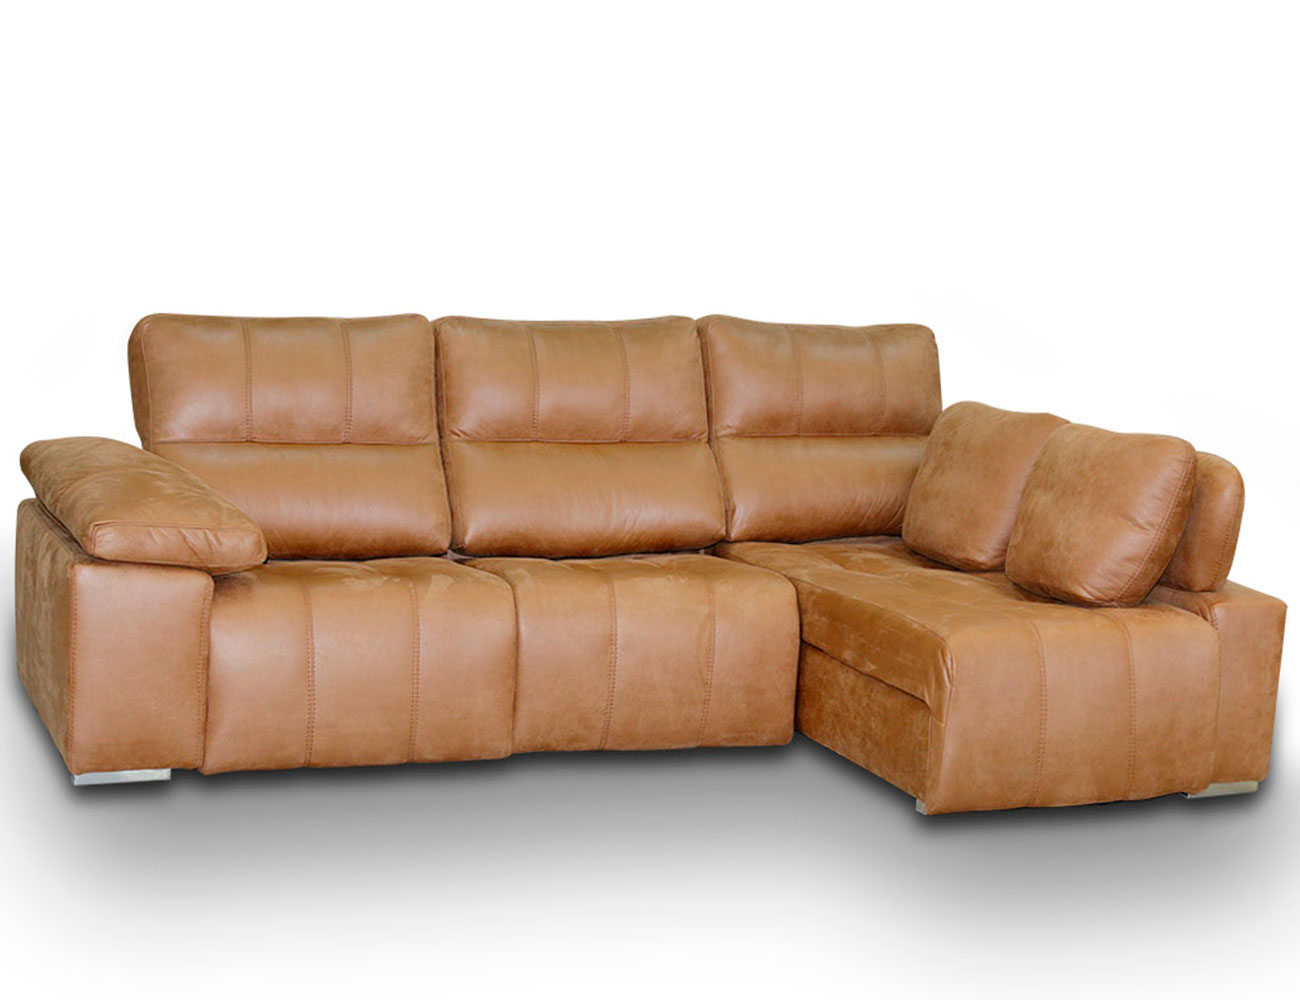 Sofa chaiselongue relax 2 motores anti manchas25